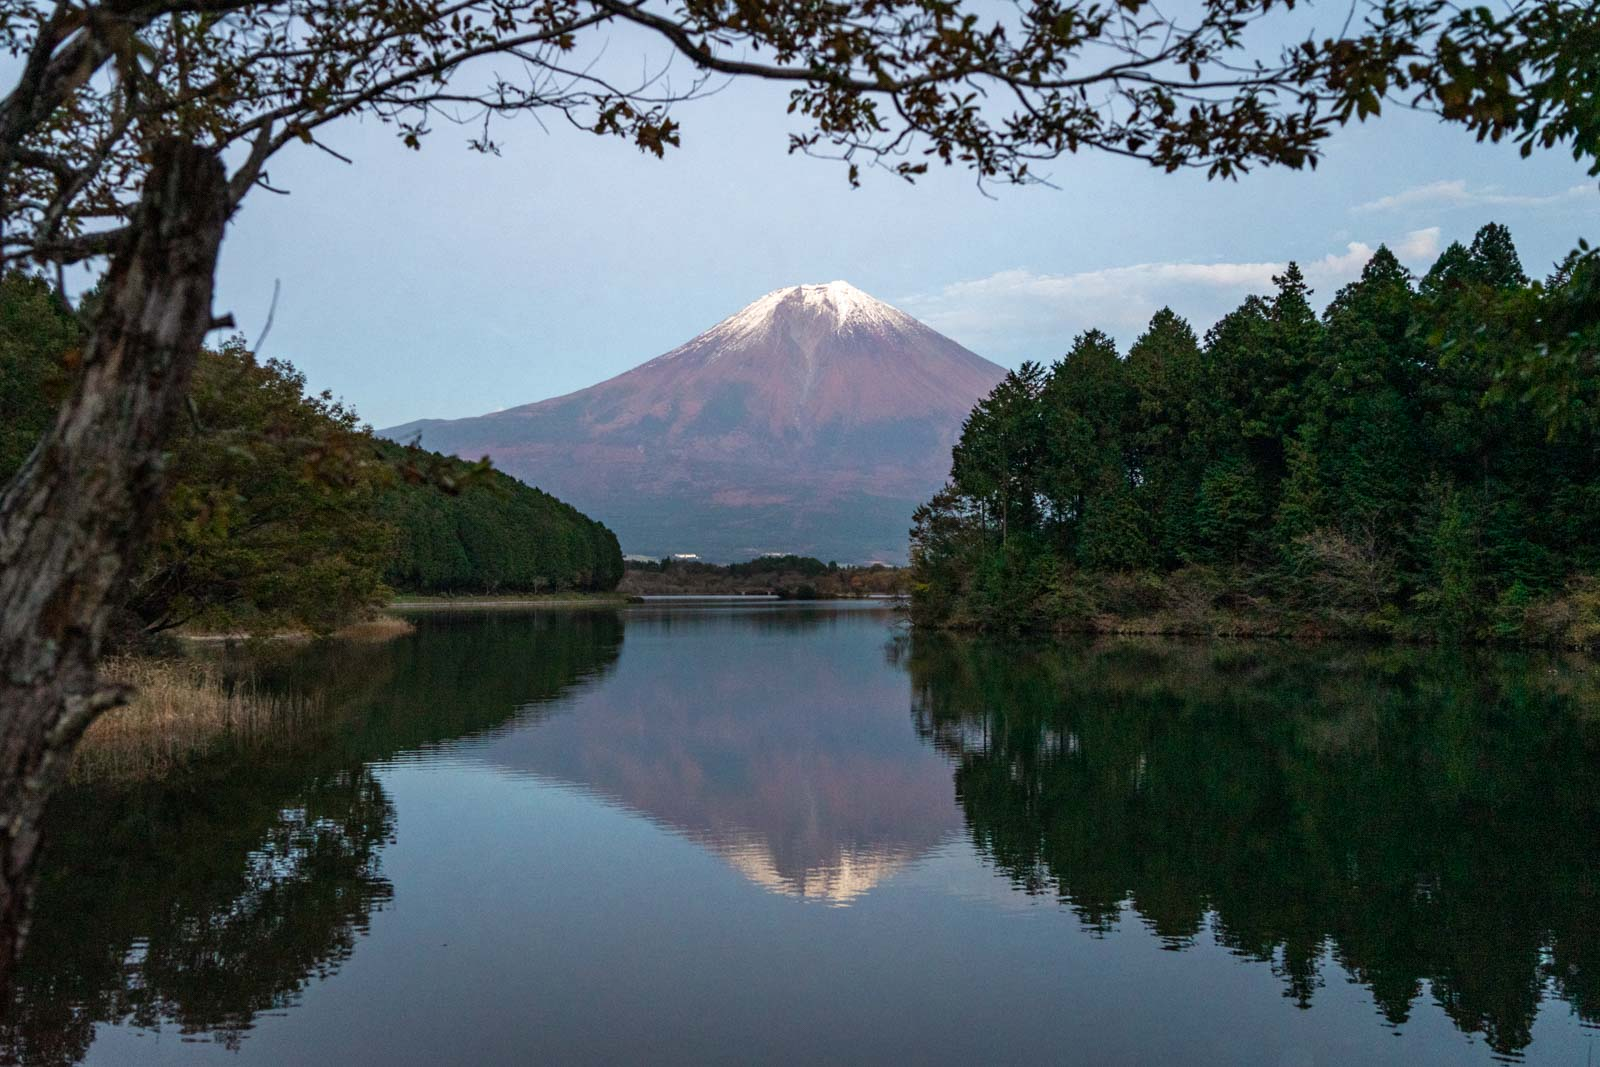 Lake Tanuki, Fuji, Japan